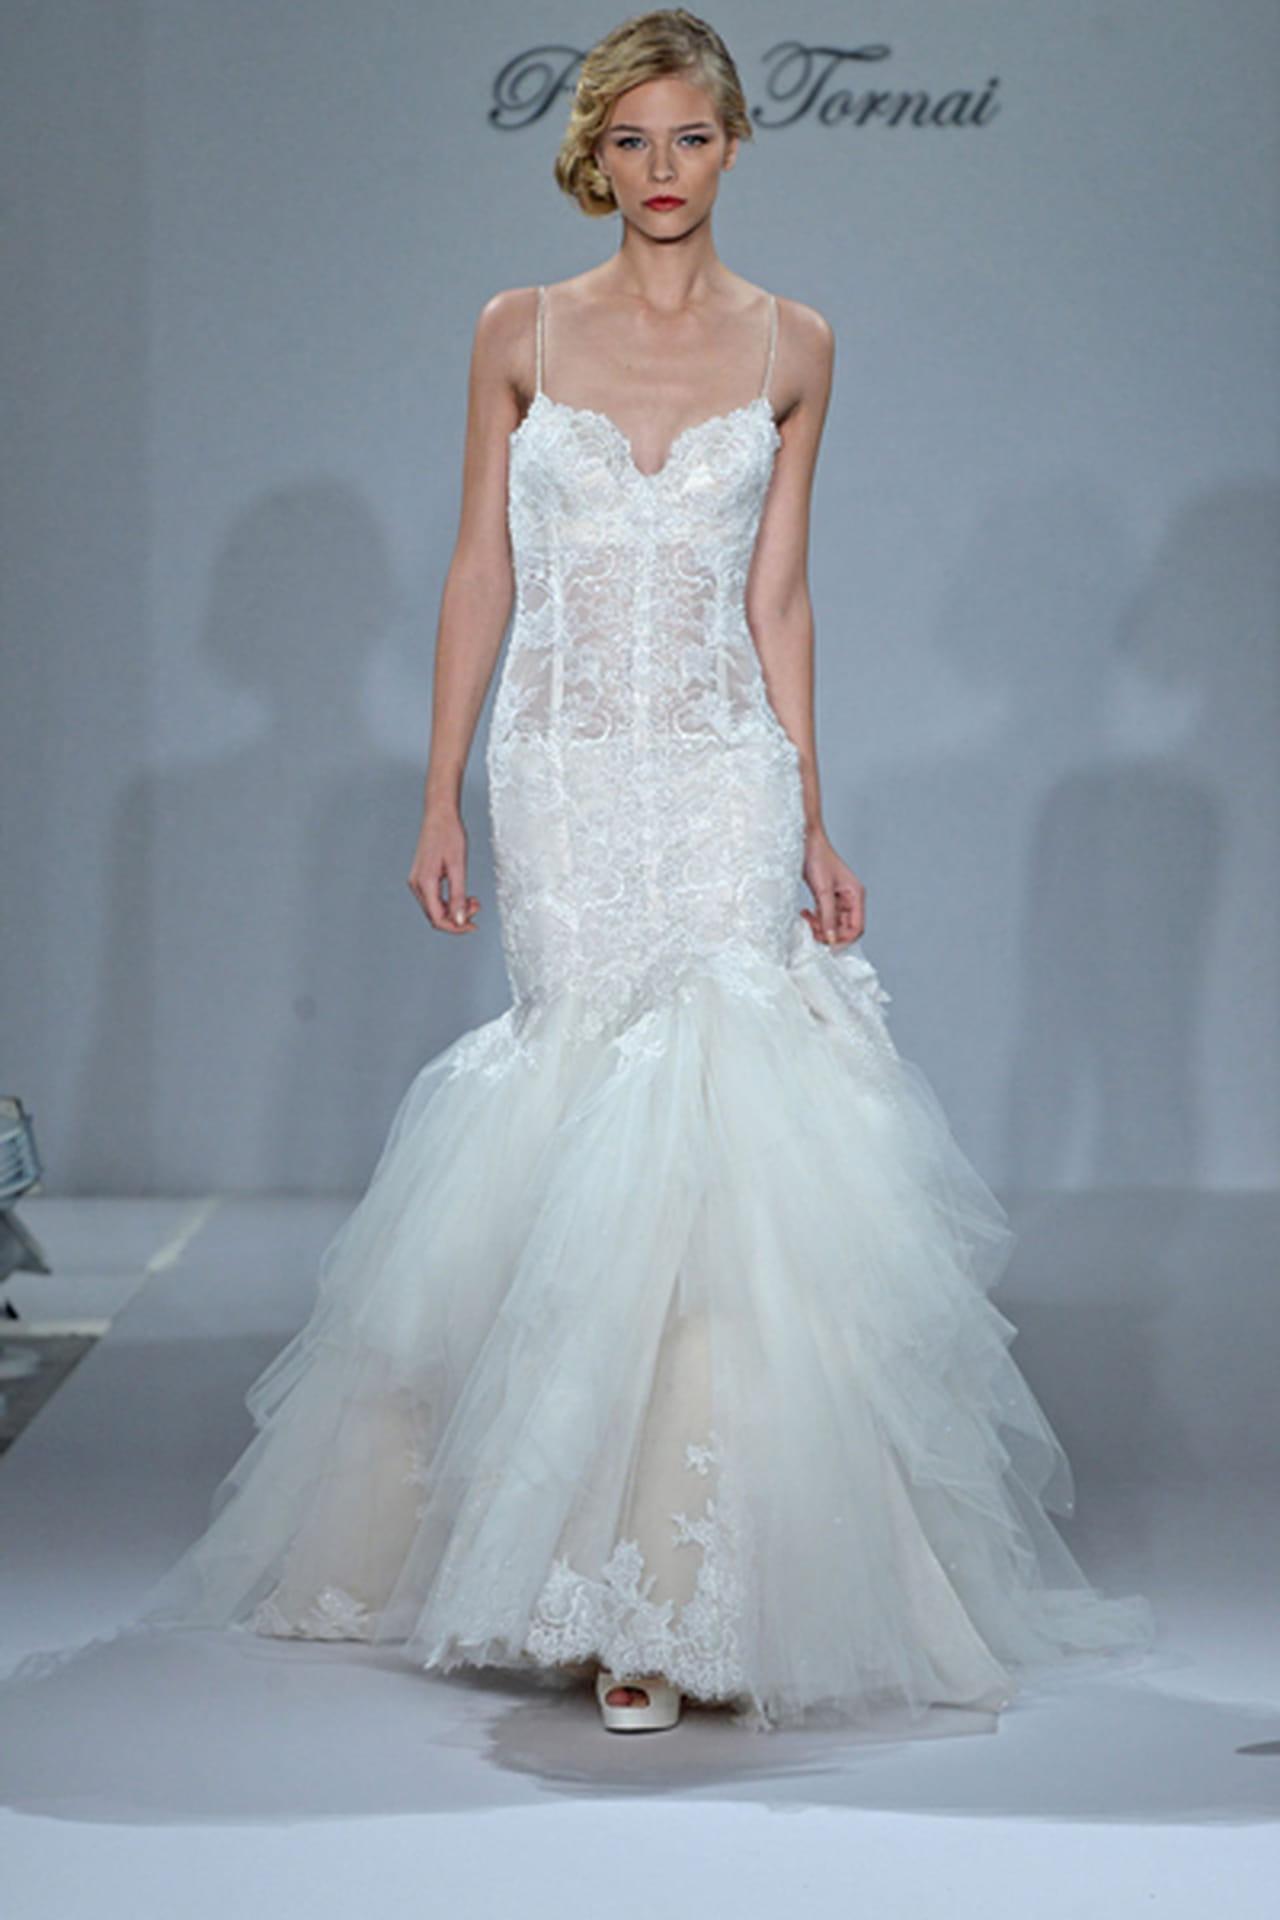 تصاميم جريئة لفساتين زفاف Pnina Tornai لموسم خريف 2015